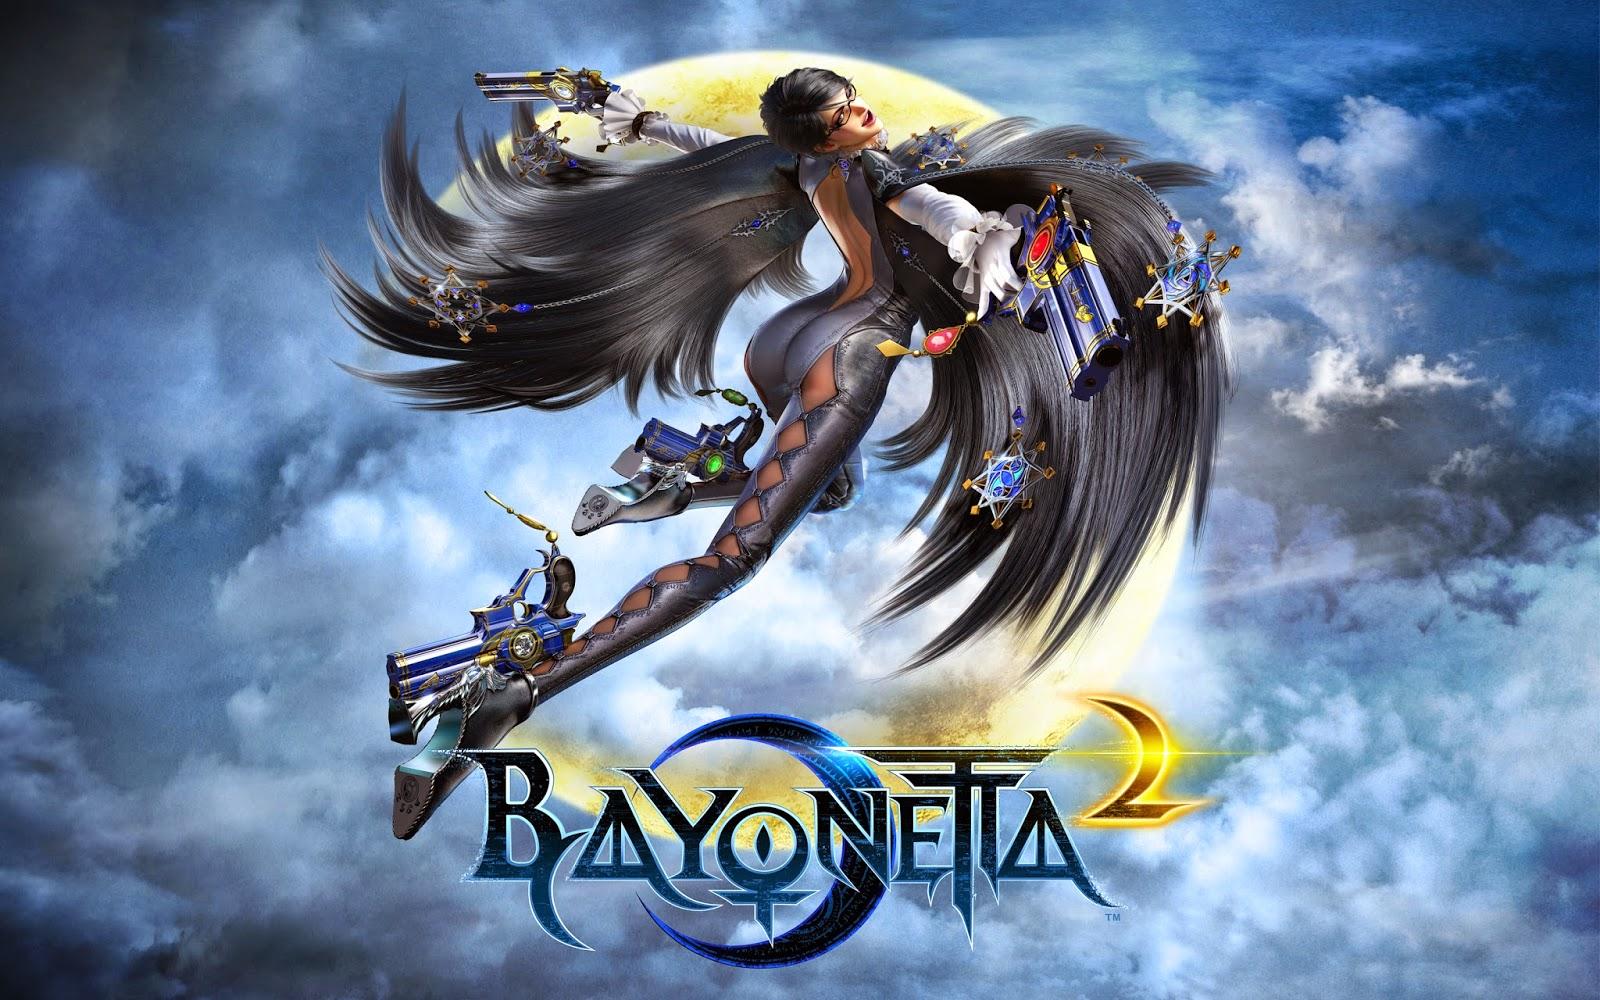 Bayonetta 2 - Review | The Bookish Gamer